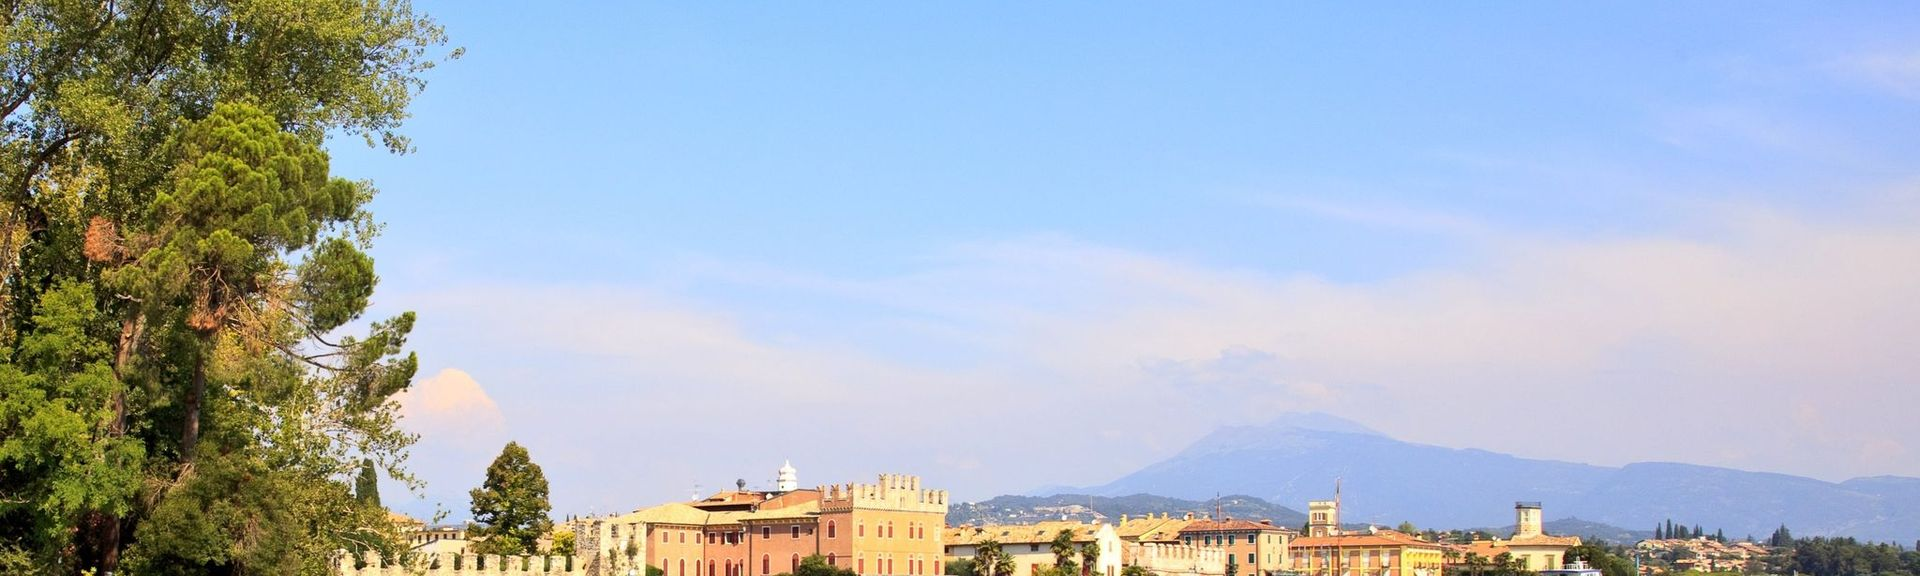 Fumane, Verona, Veneto, Italy